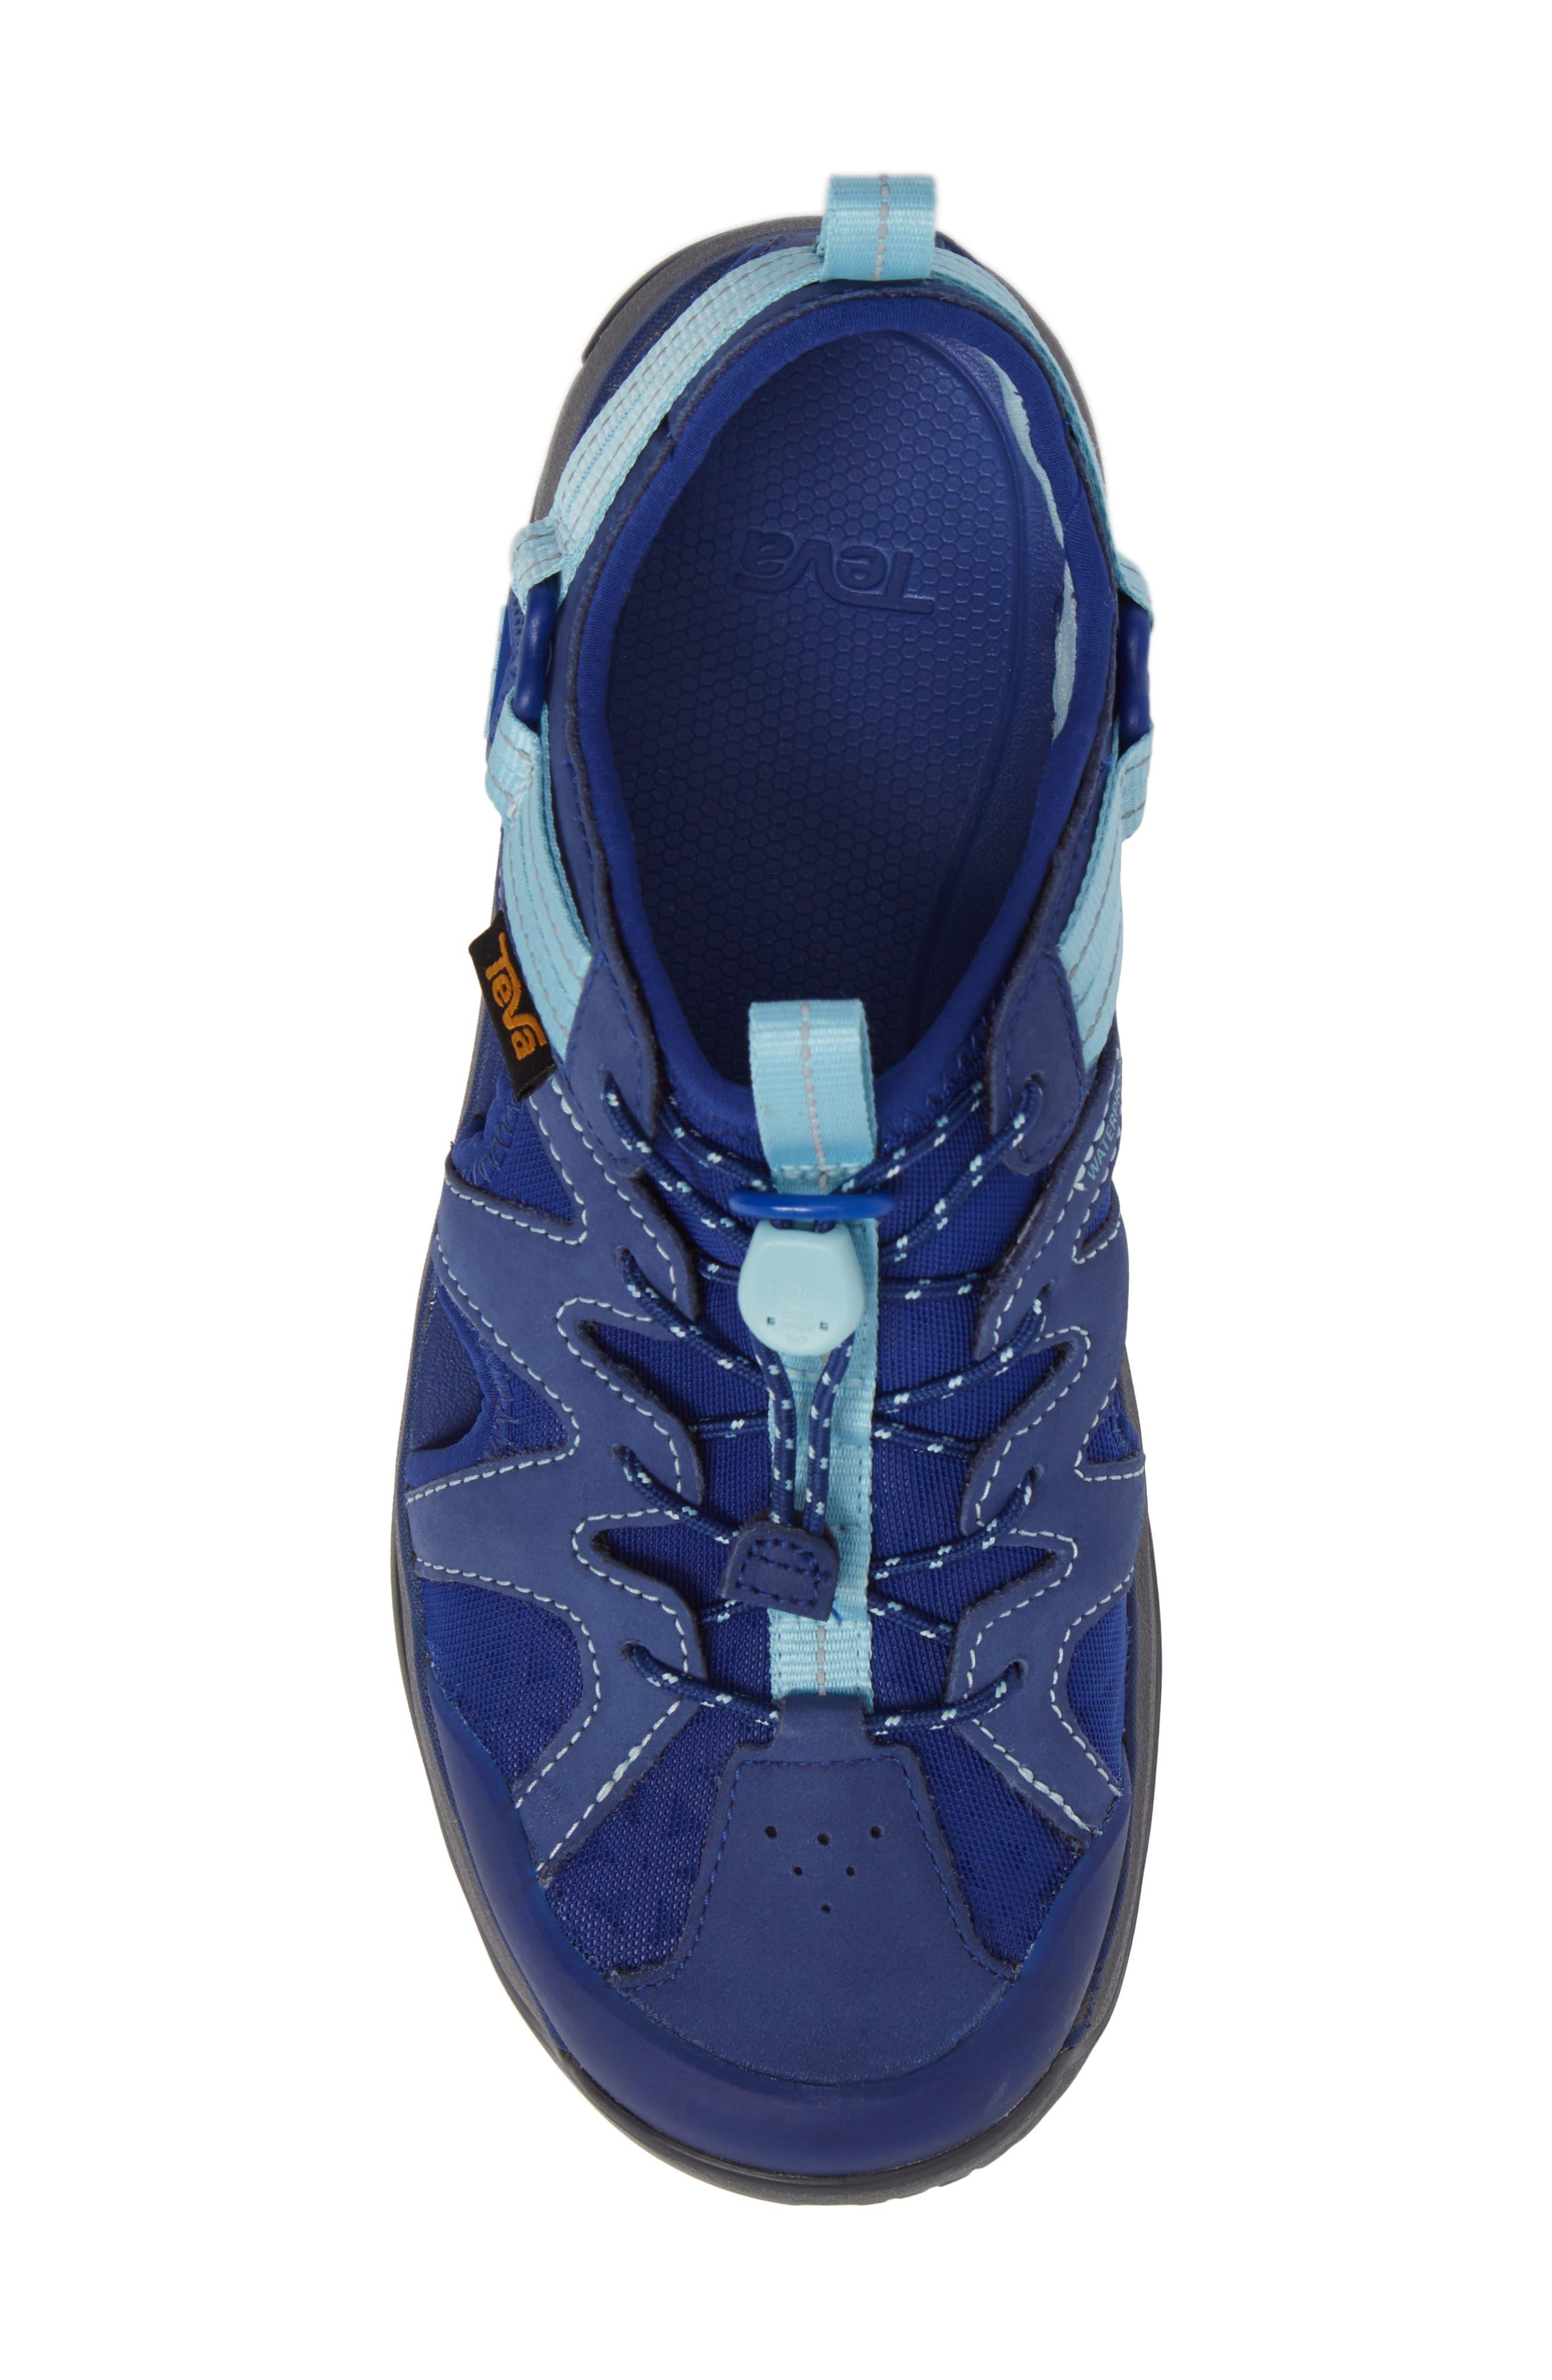 Terra Float Active Sandal,                             Alternate thumbnail 20, color,